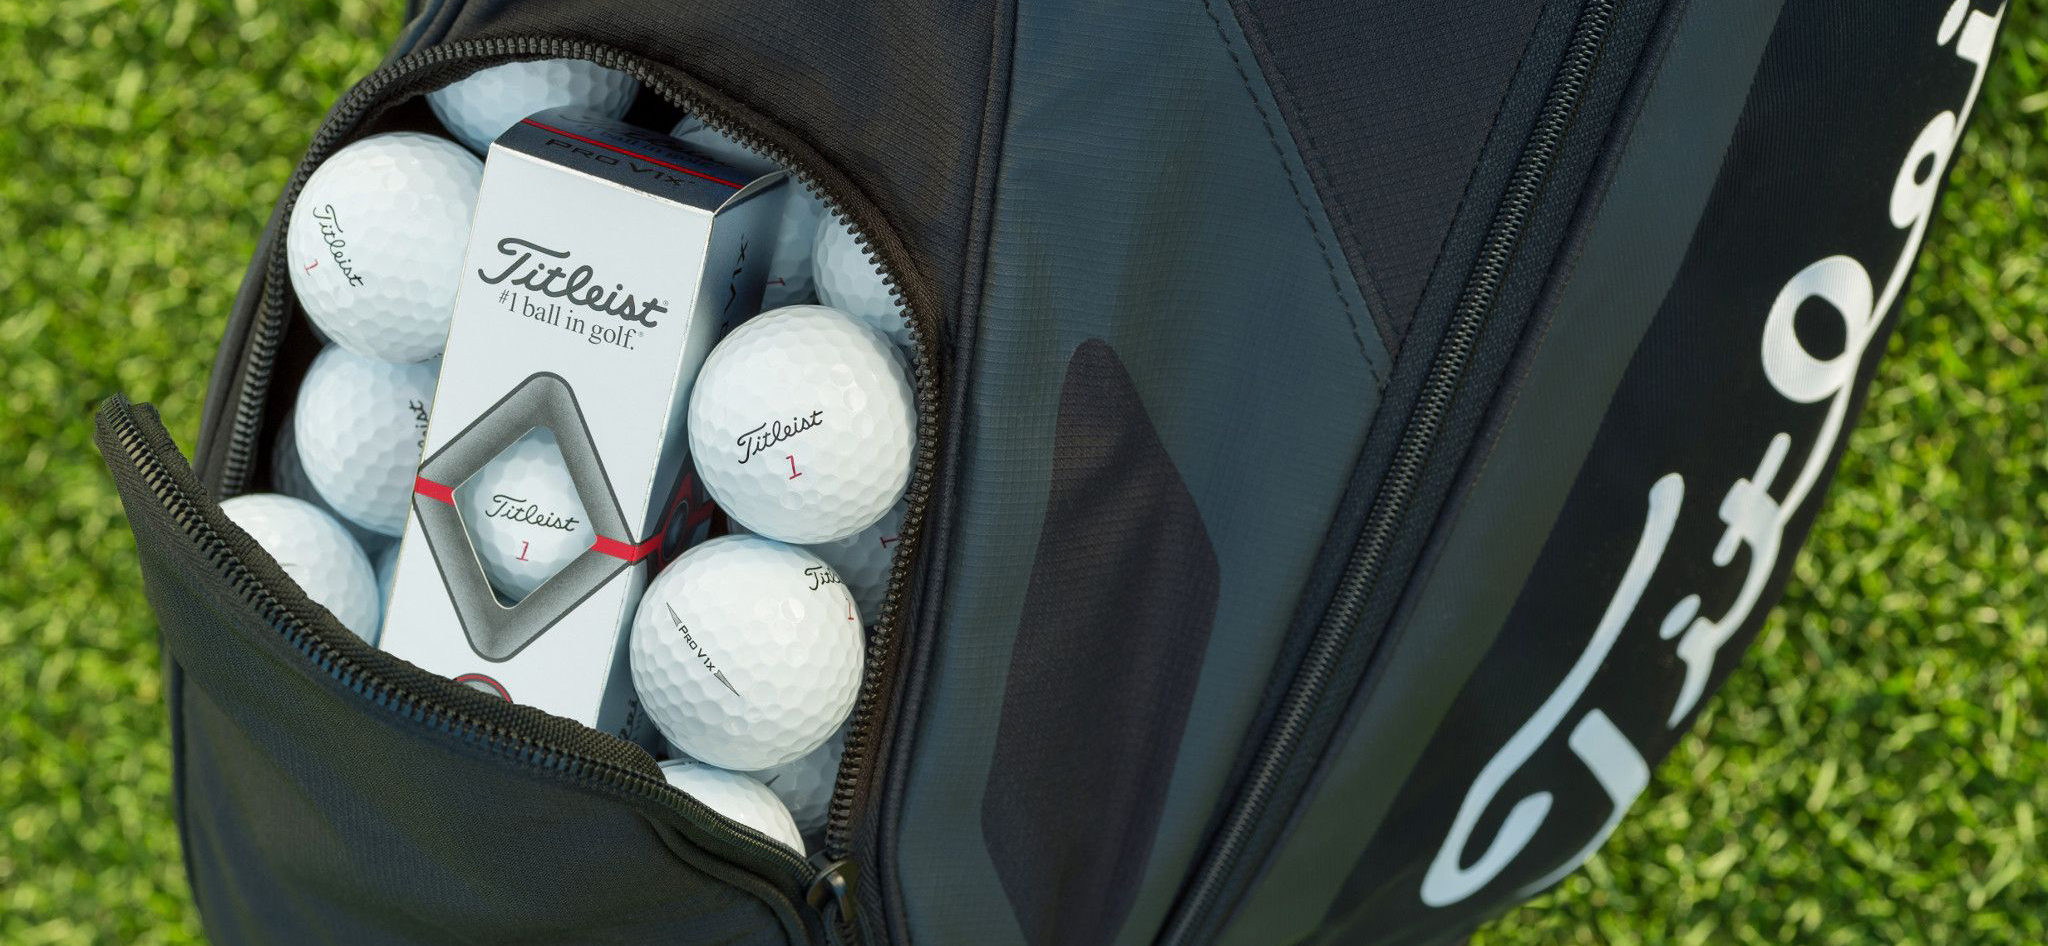 titleist pro v1 golf ball pocket